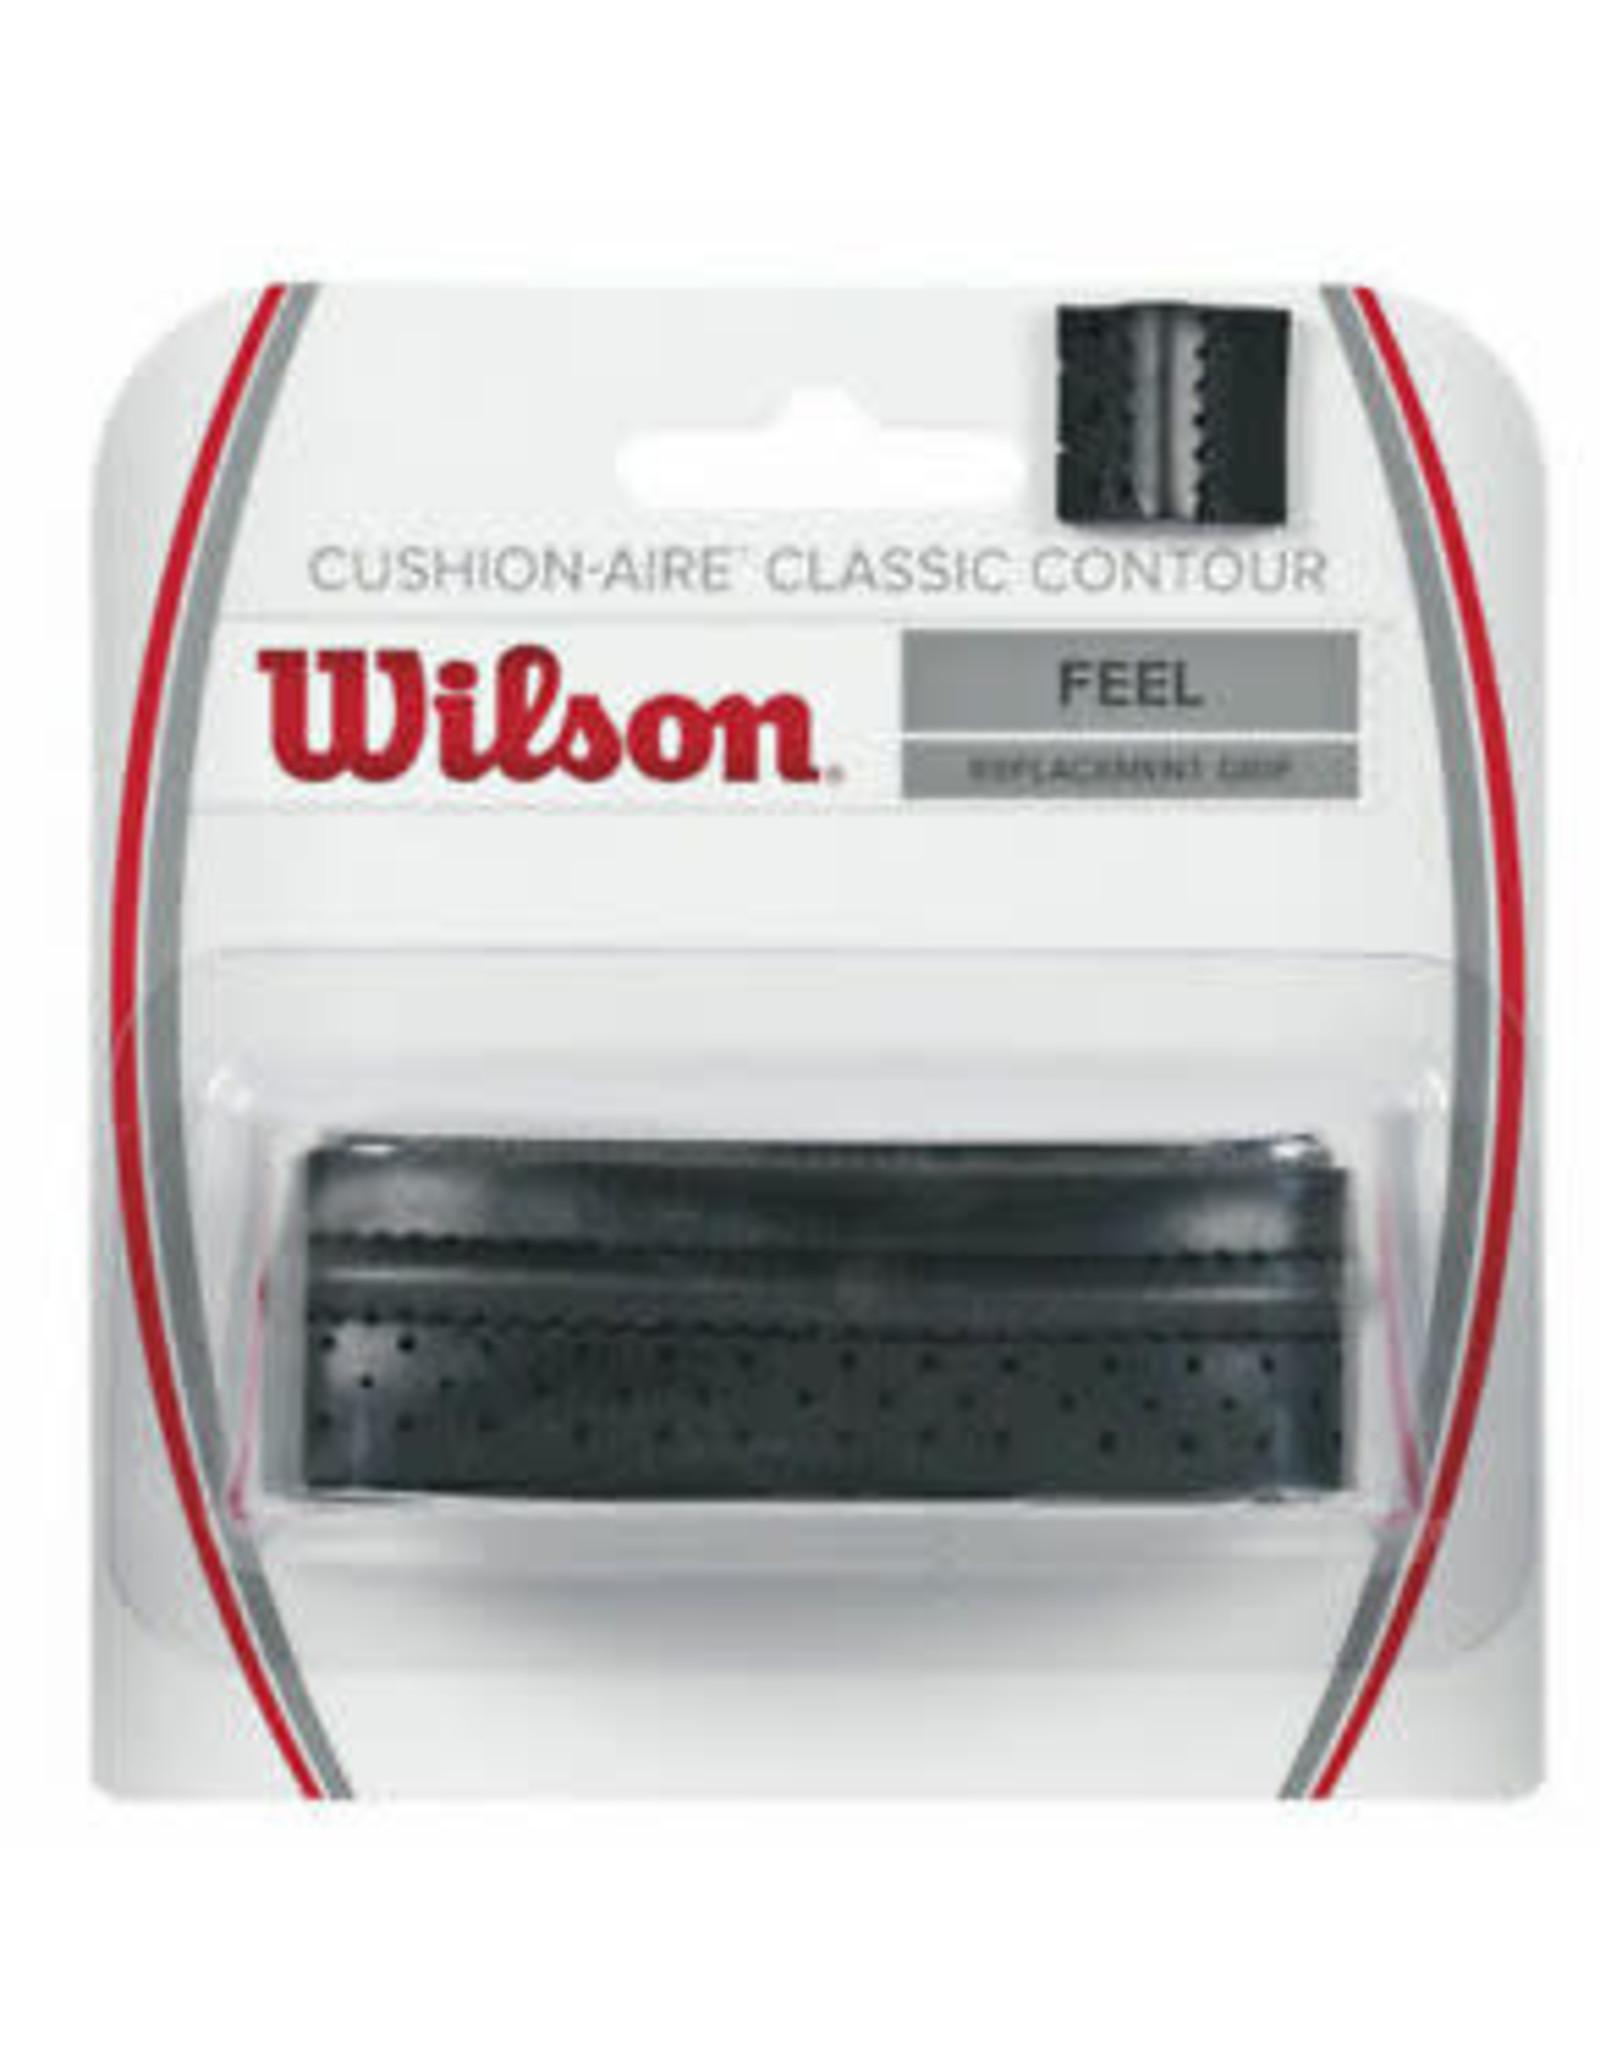 Wilson Wilson Cushion-Aire Classic Contour